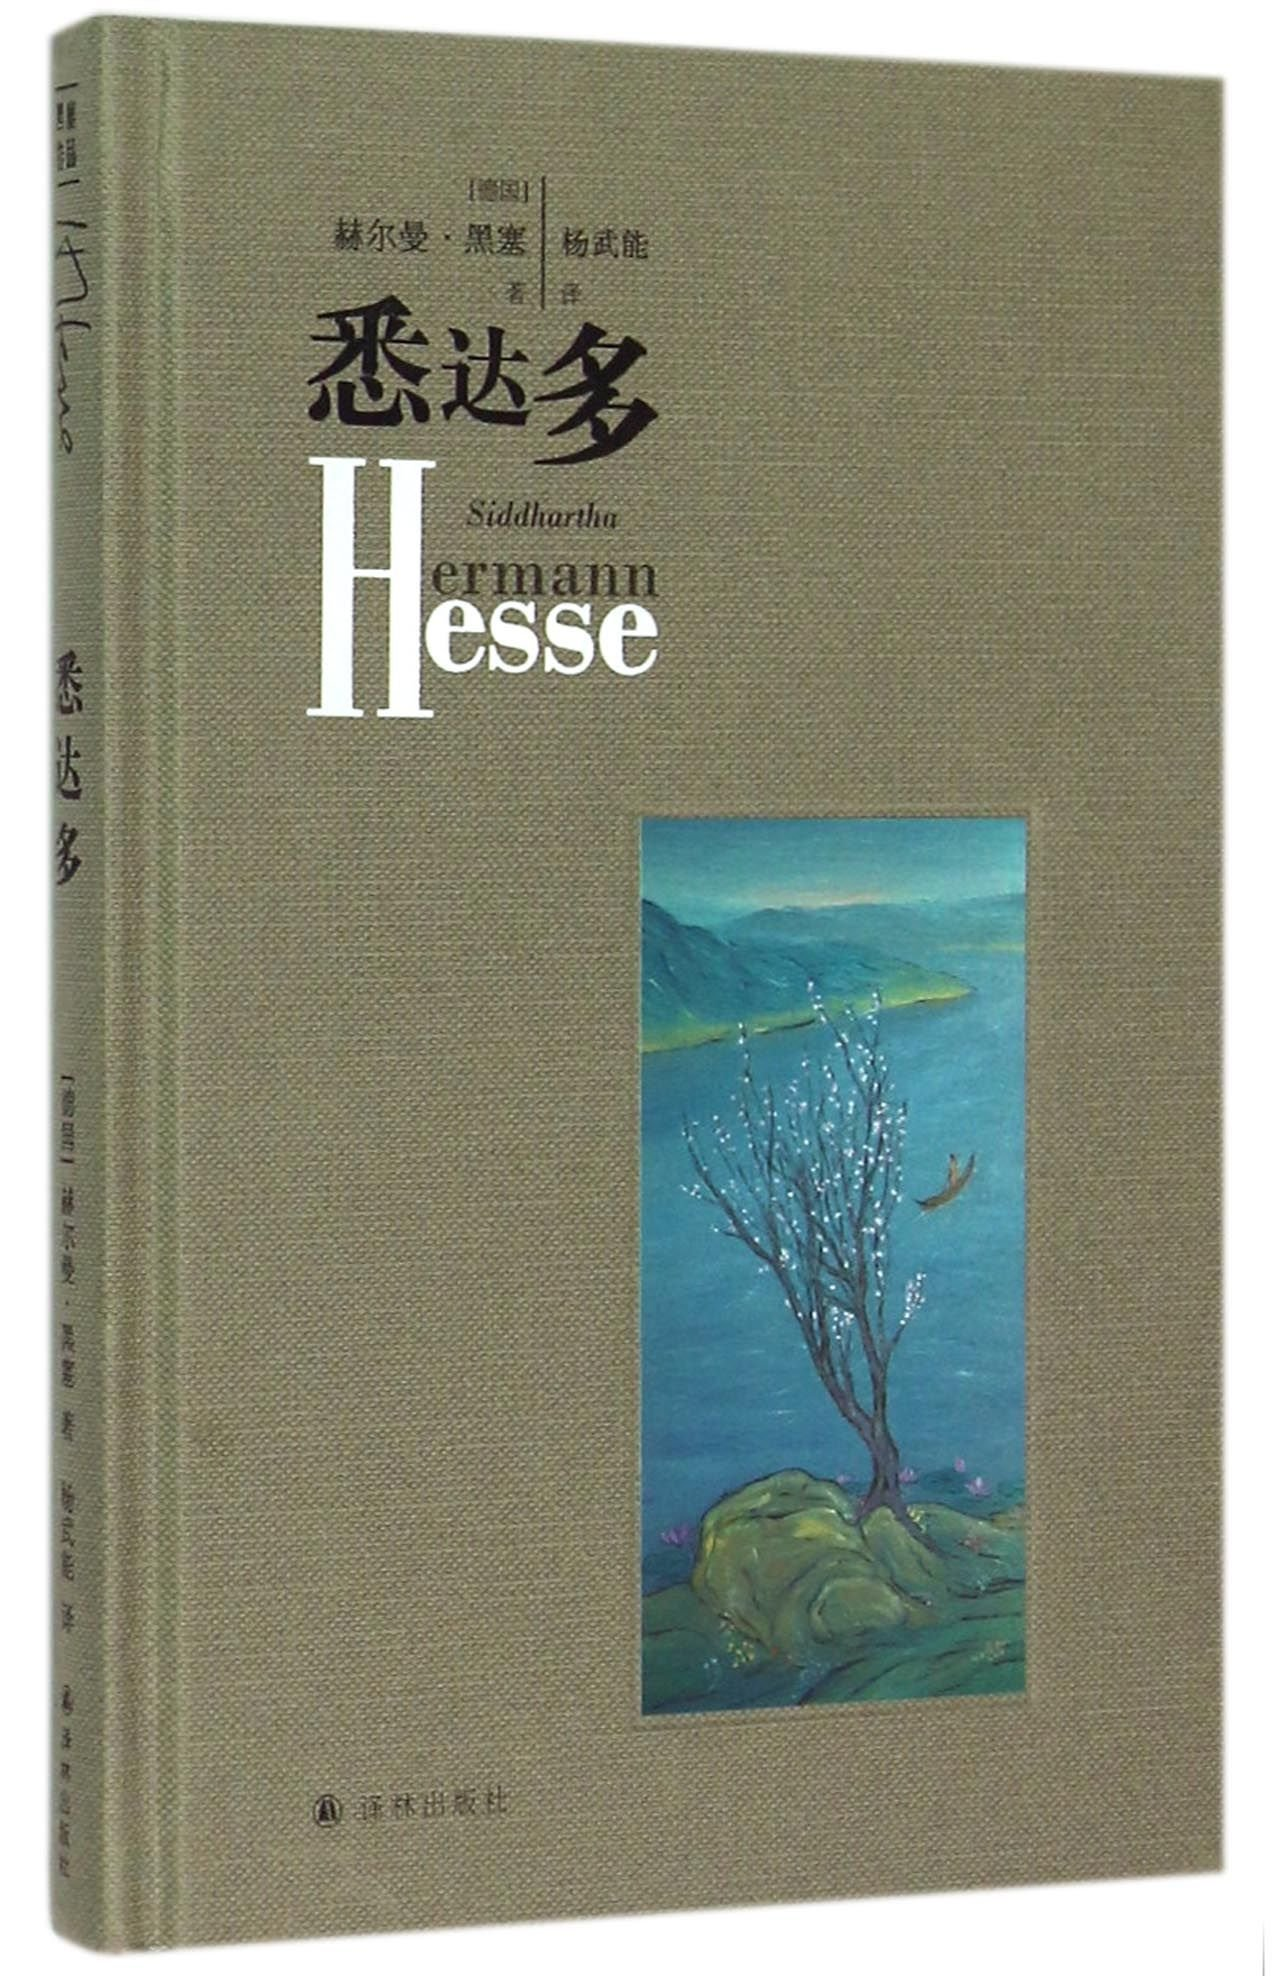 Siddhartha (Hardcover) (Chinese Edition)